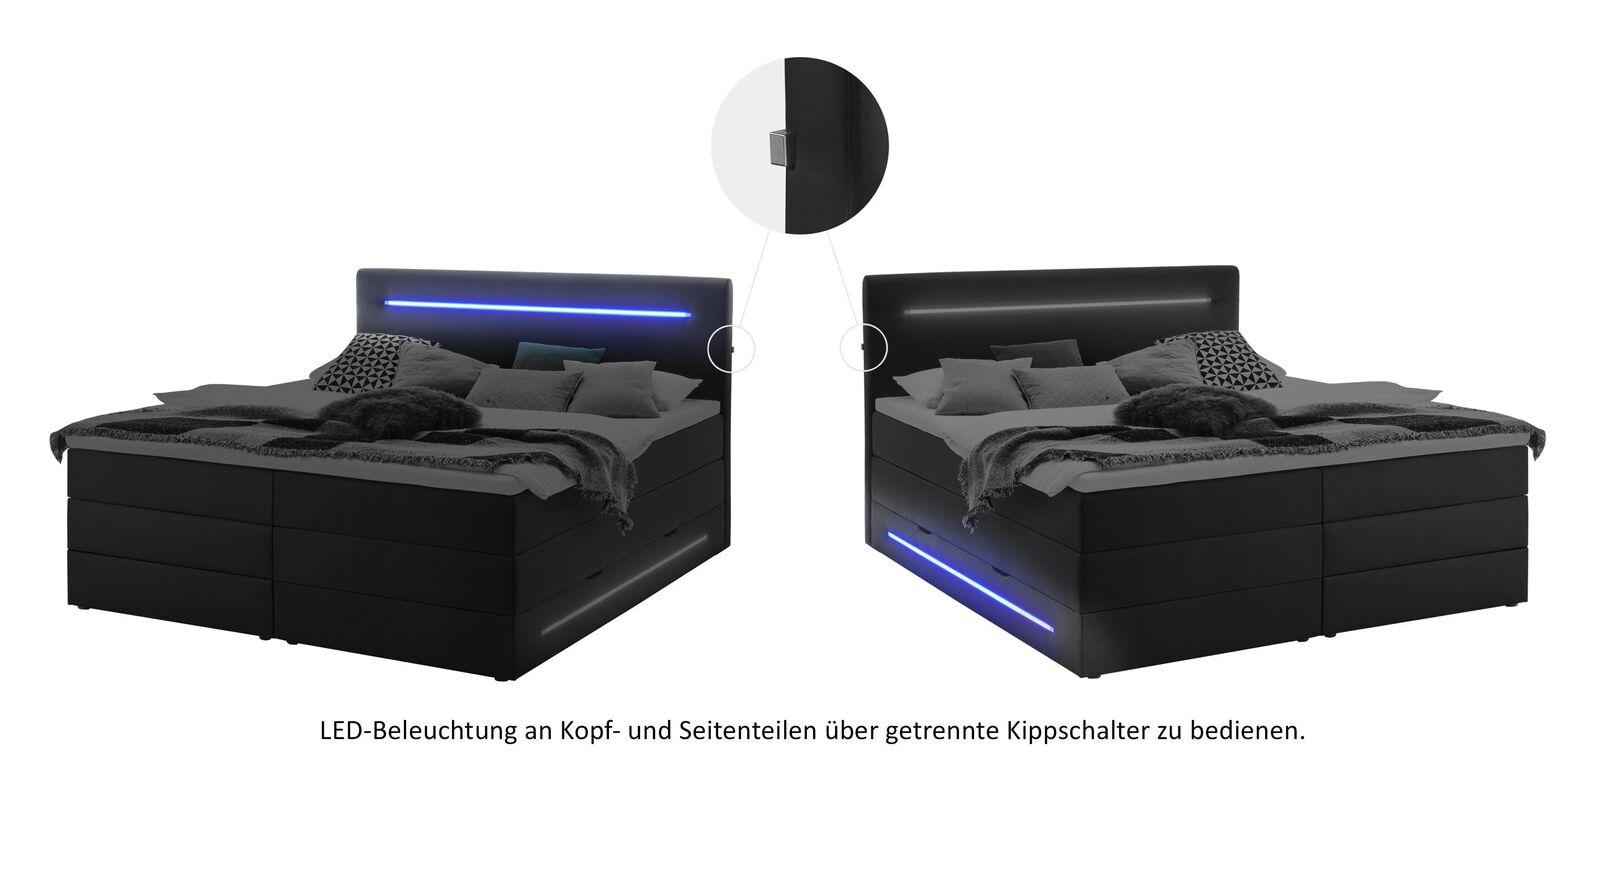 Grafik zur LED-Beleuchtung zum Bettkasten-Boxspringbett Tollocan